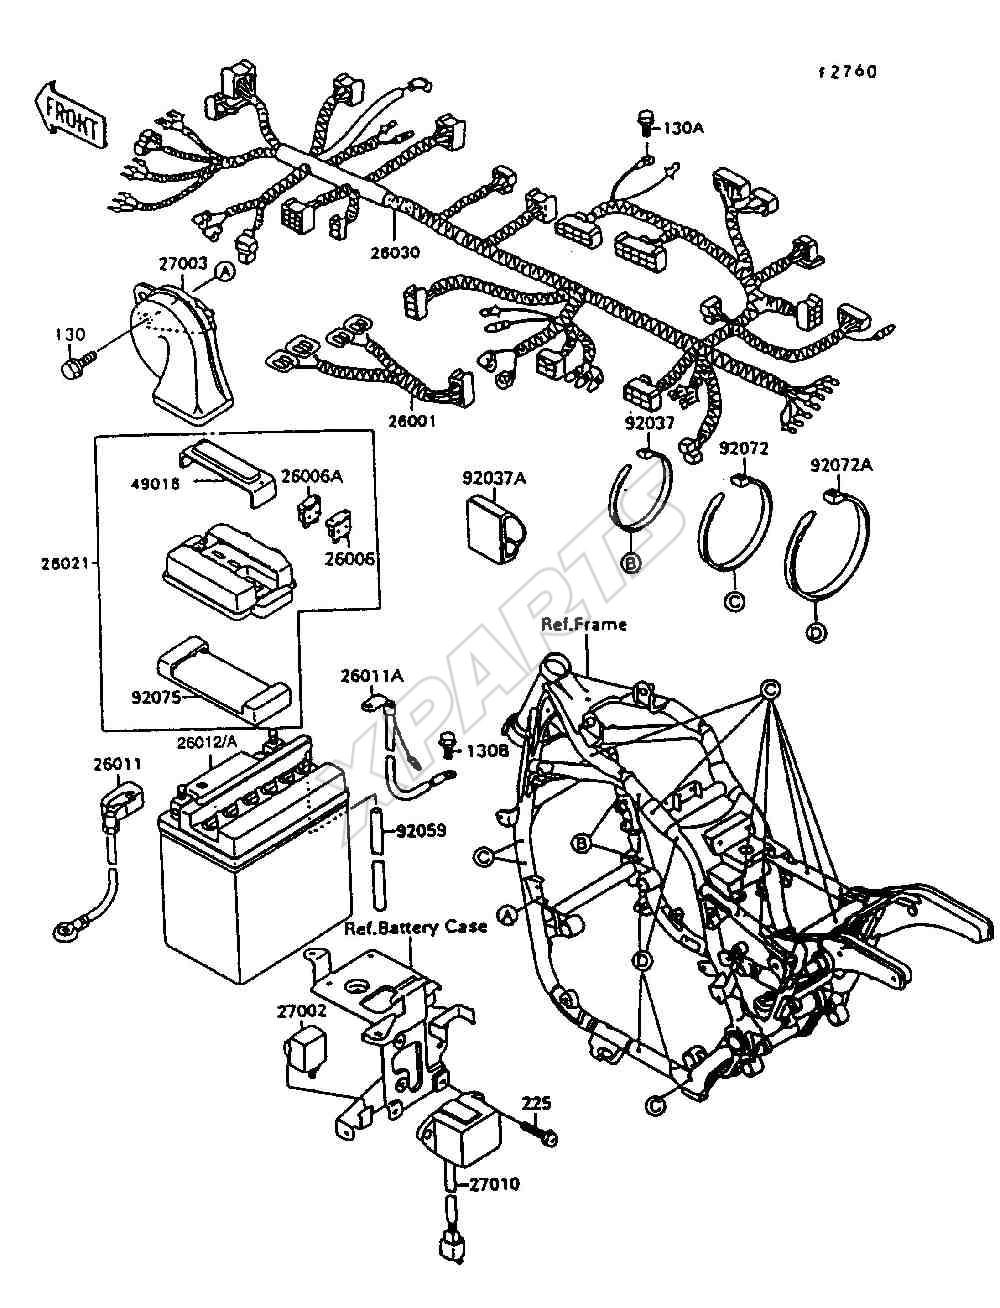 Kawasaki Vulcan 800 Ignition Wiring / Vulcan Wiring